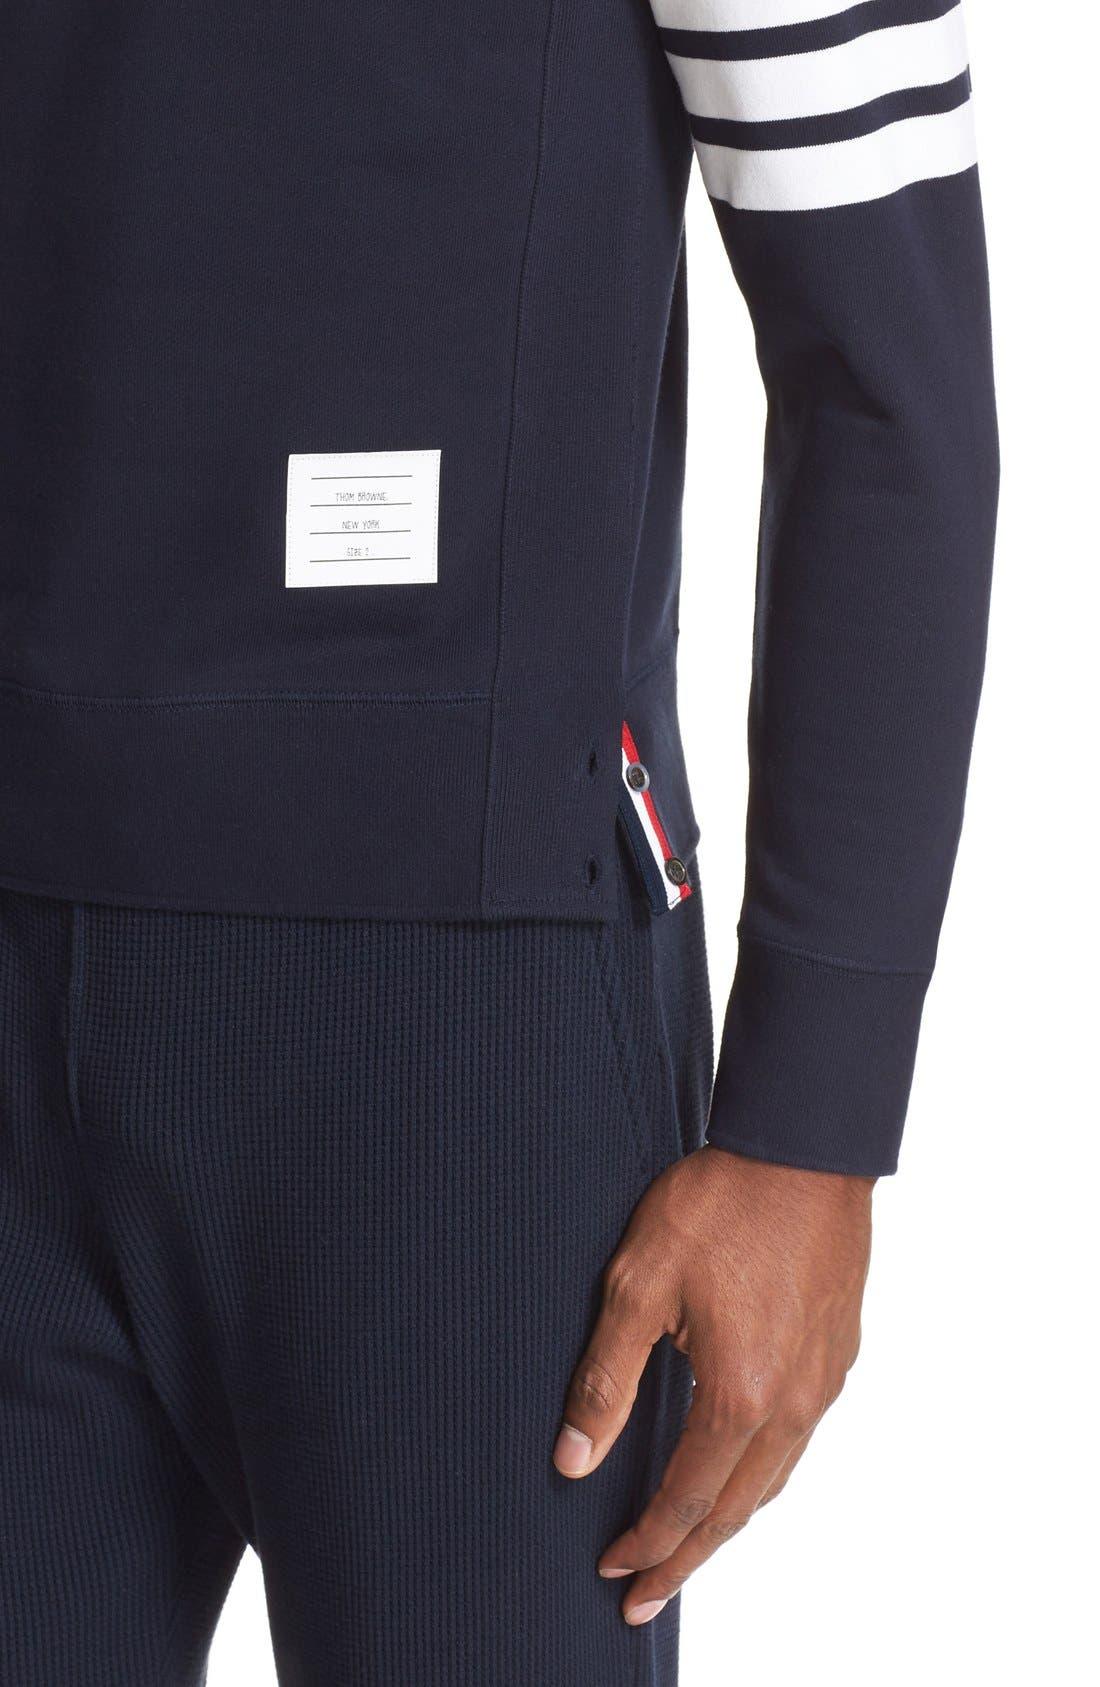 Stripe Sleeve Sweatshirt,                             Alternate thumbnail 4, color,                             Navy/ Optic White